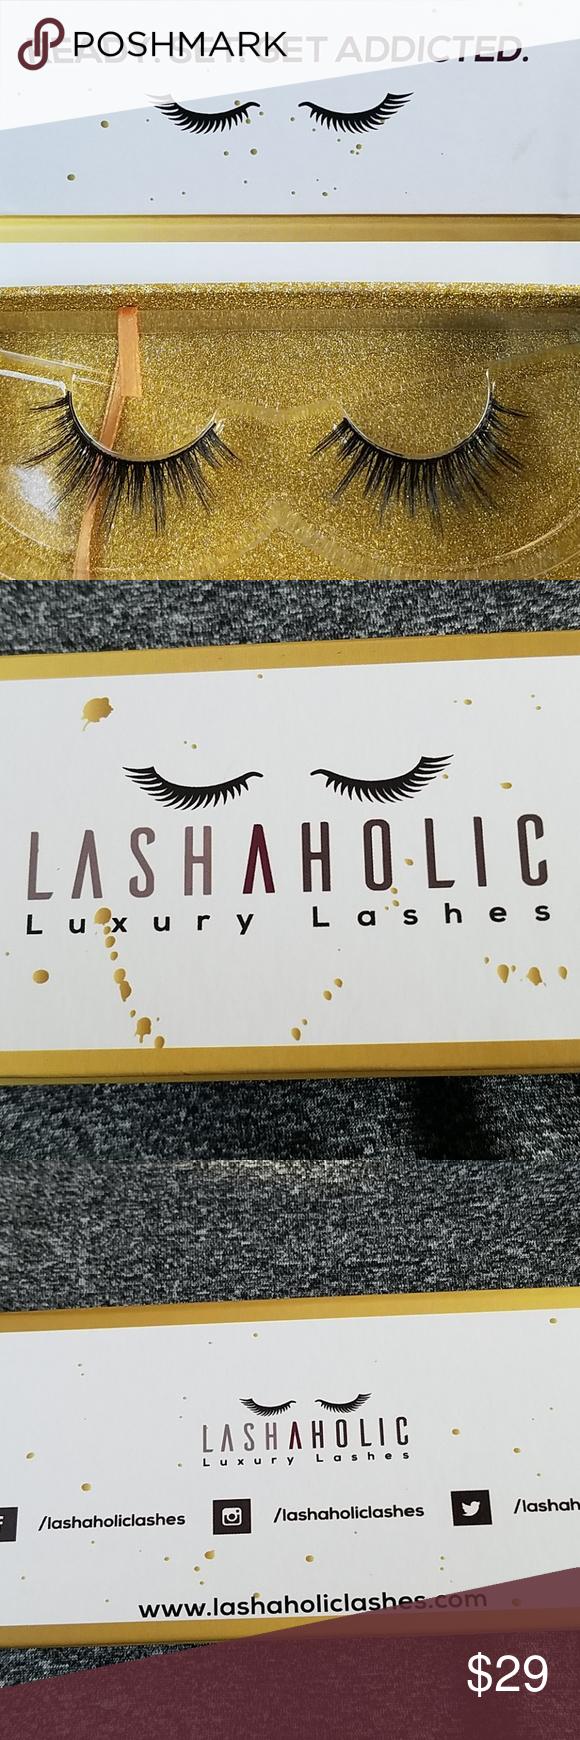 b7e51482eee Lashaholic instaglam black VEGAN false eyelashes 100% Vegan Made from 100%  Silk fibers.